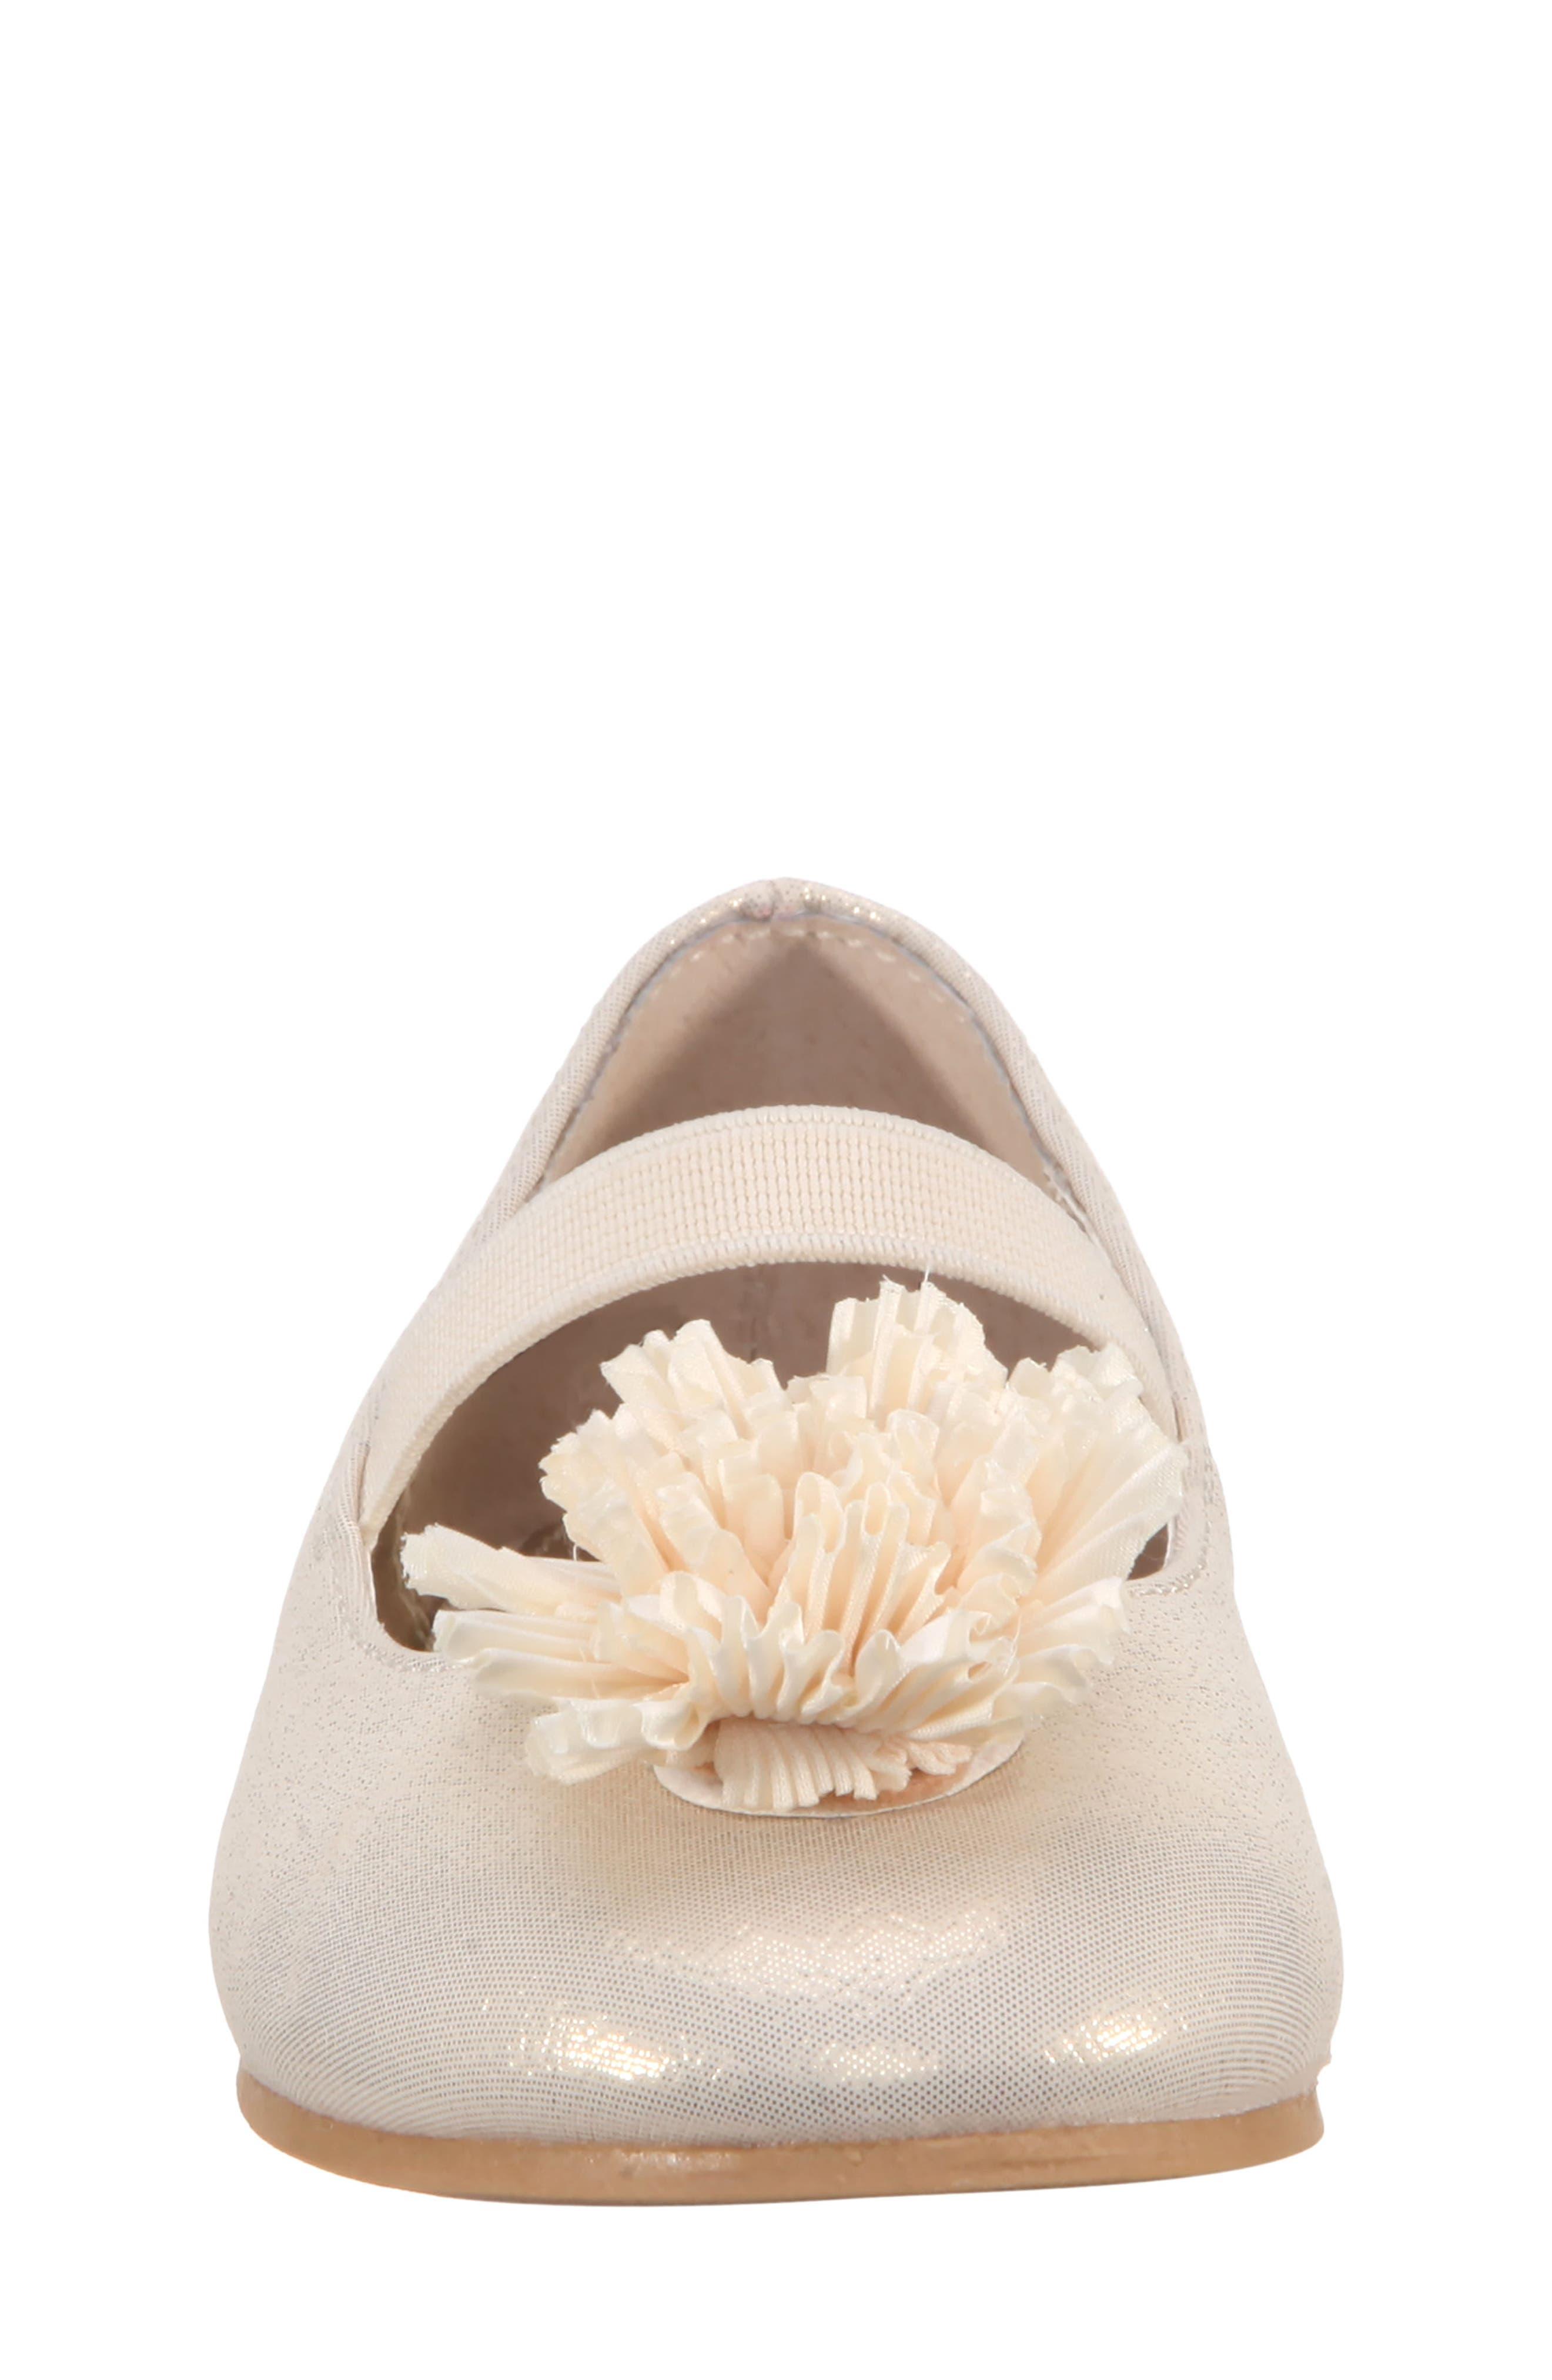 Jemma-T Bow Ballet Flat,                             Alternate thumbnail 4, color,                             040